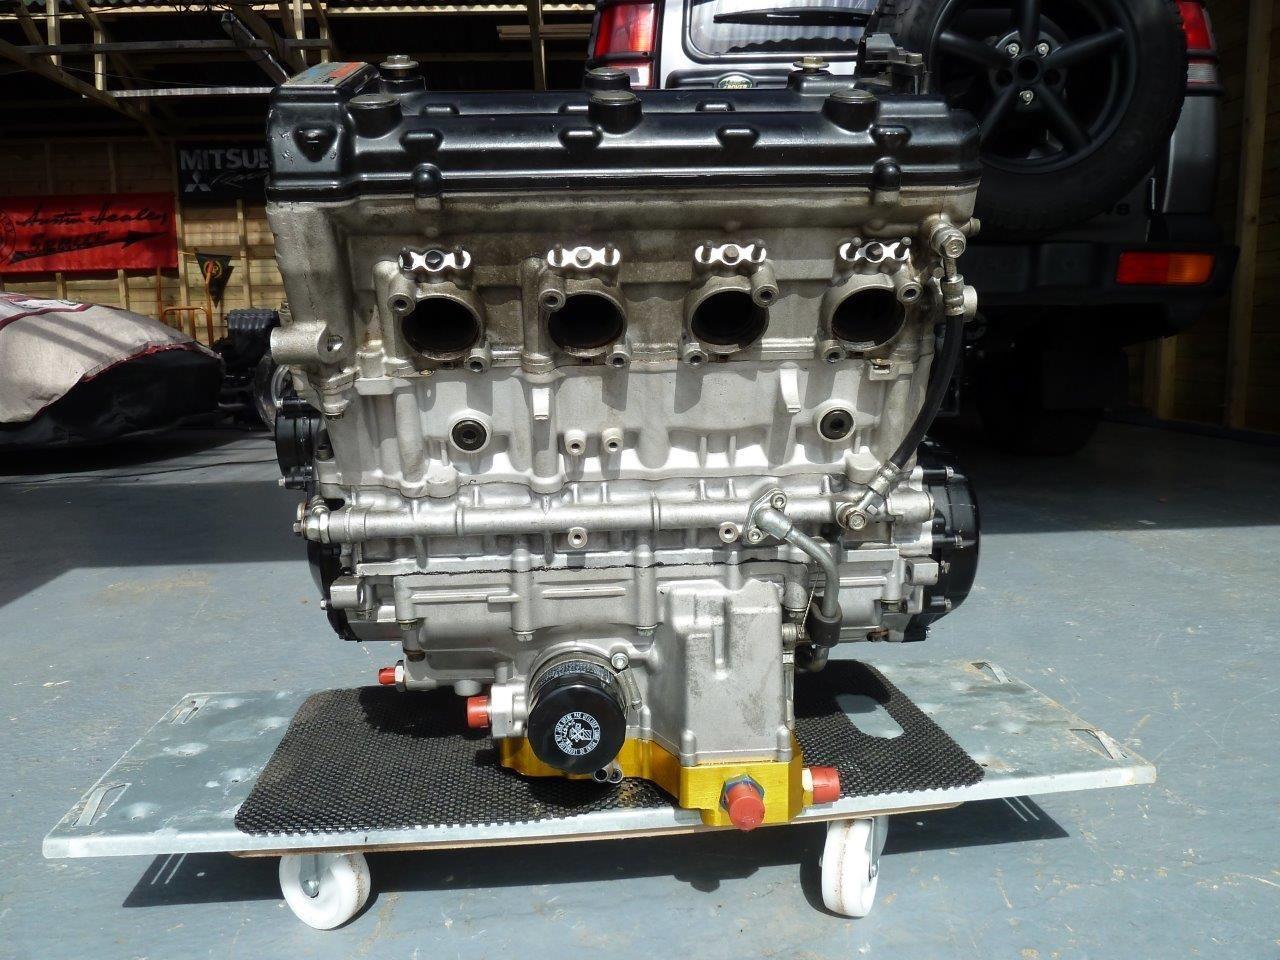 Suzuki Hayabusa Cc Engine For Sale